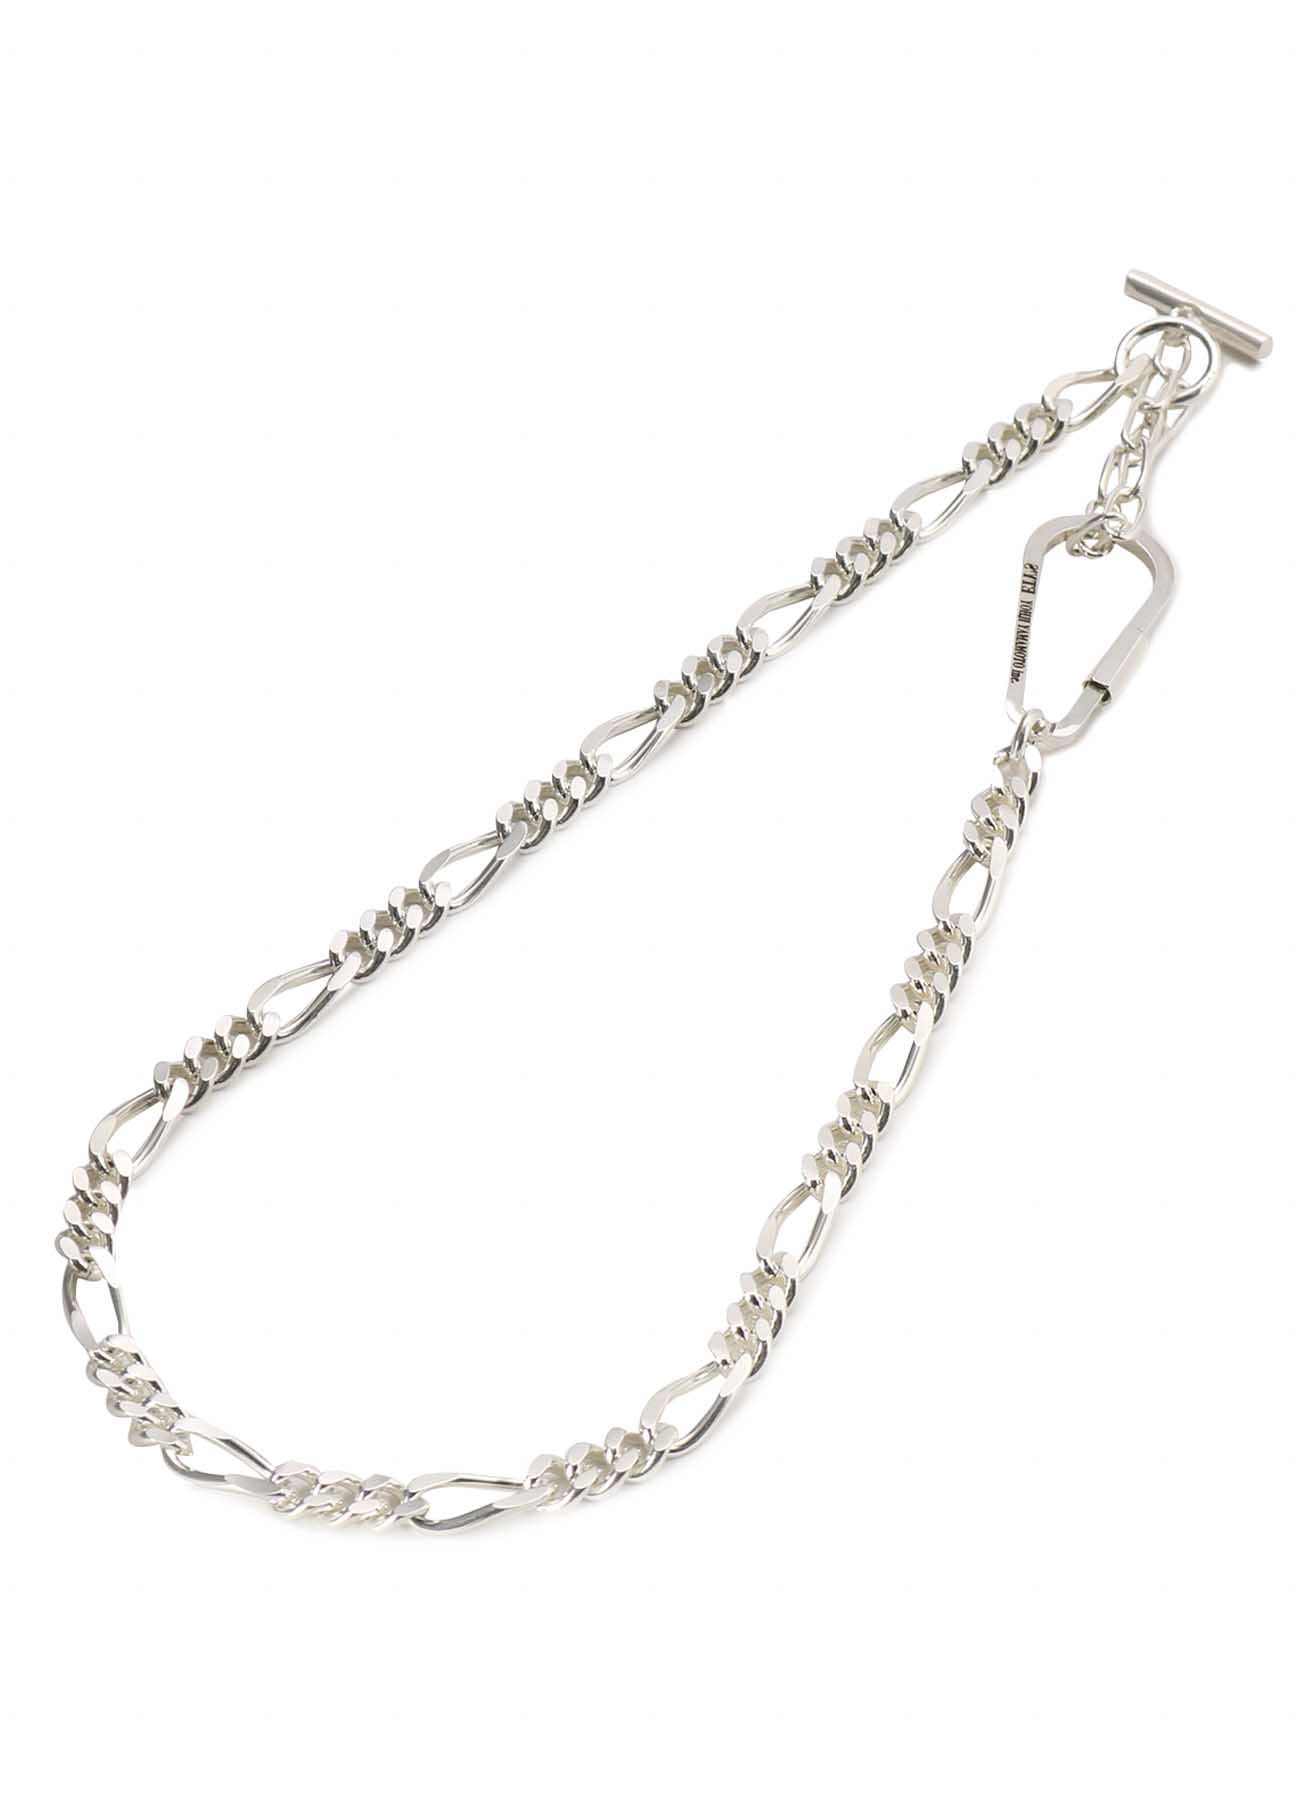 Brass Figaro Wallet Chain Necklace